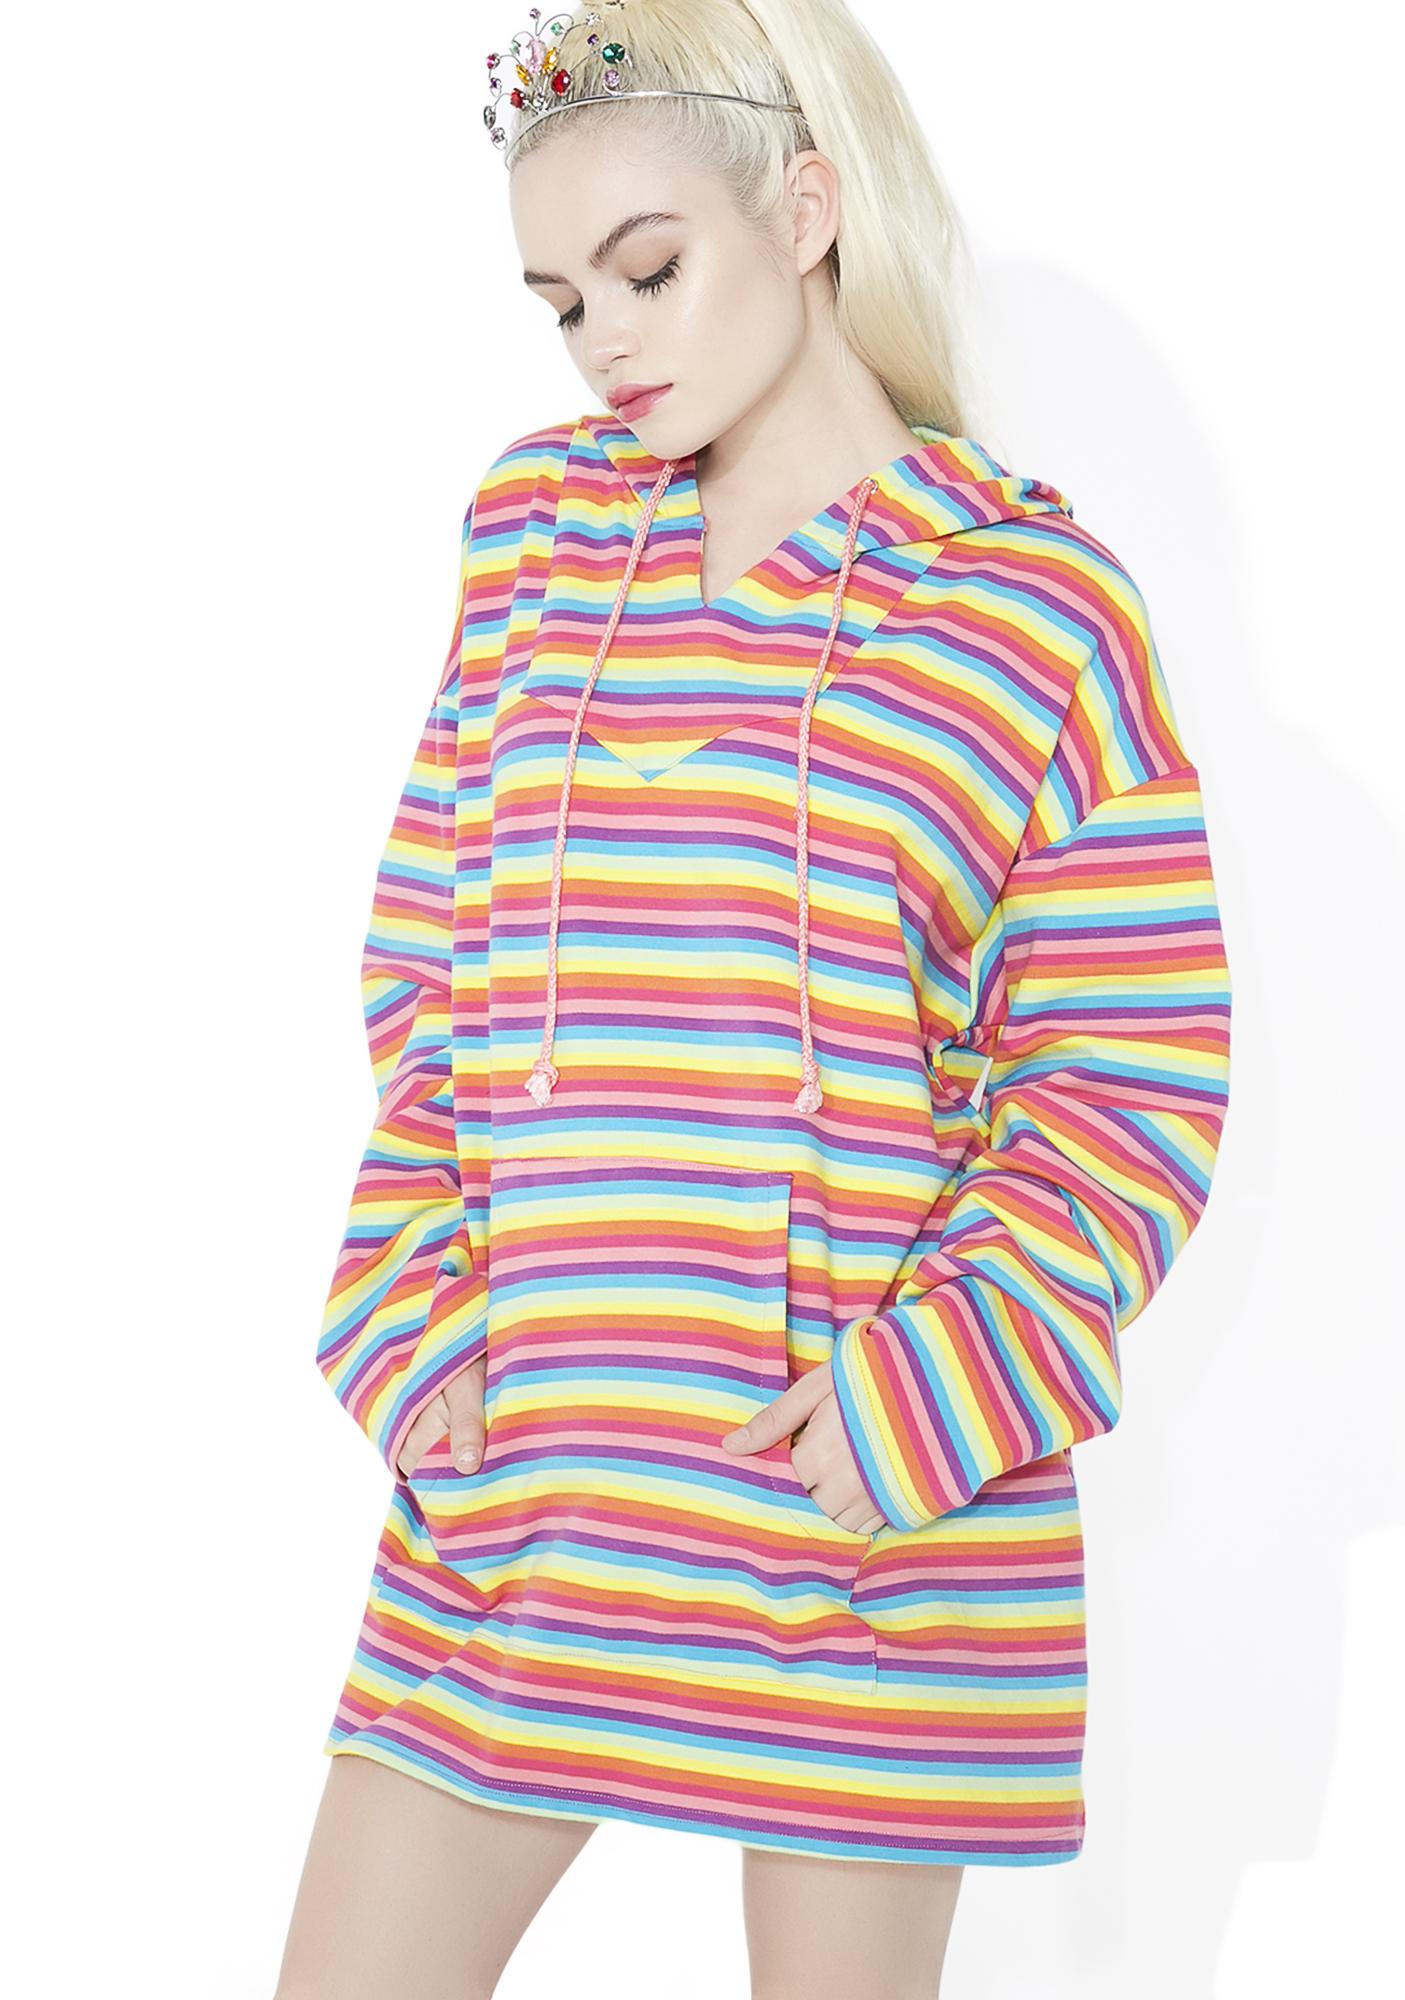 Sugar Thrillz Rainbow Crash Striped Hoodie